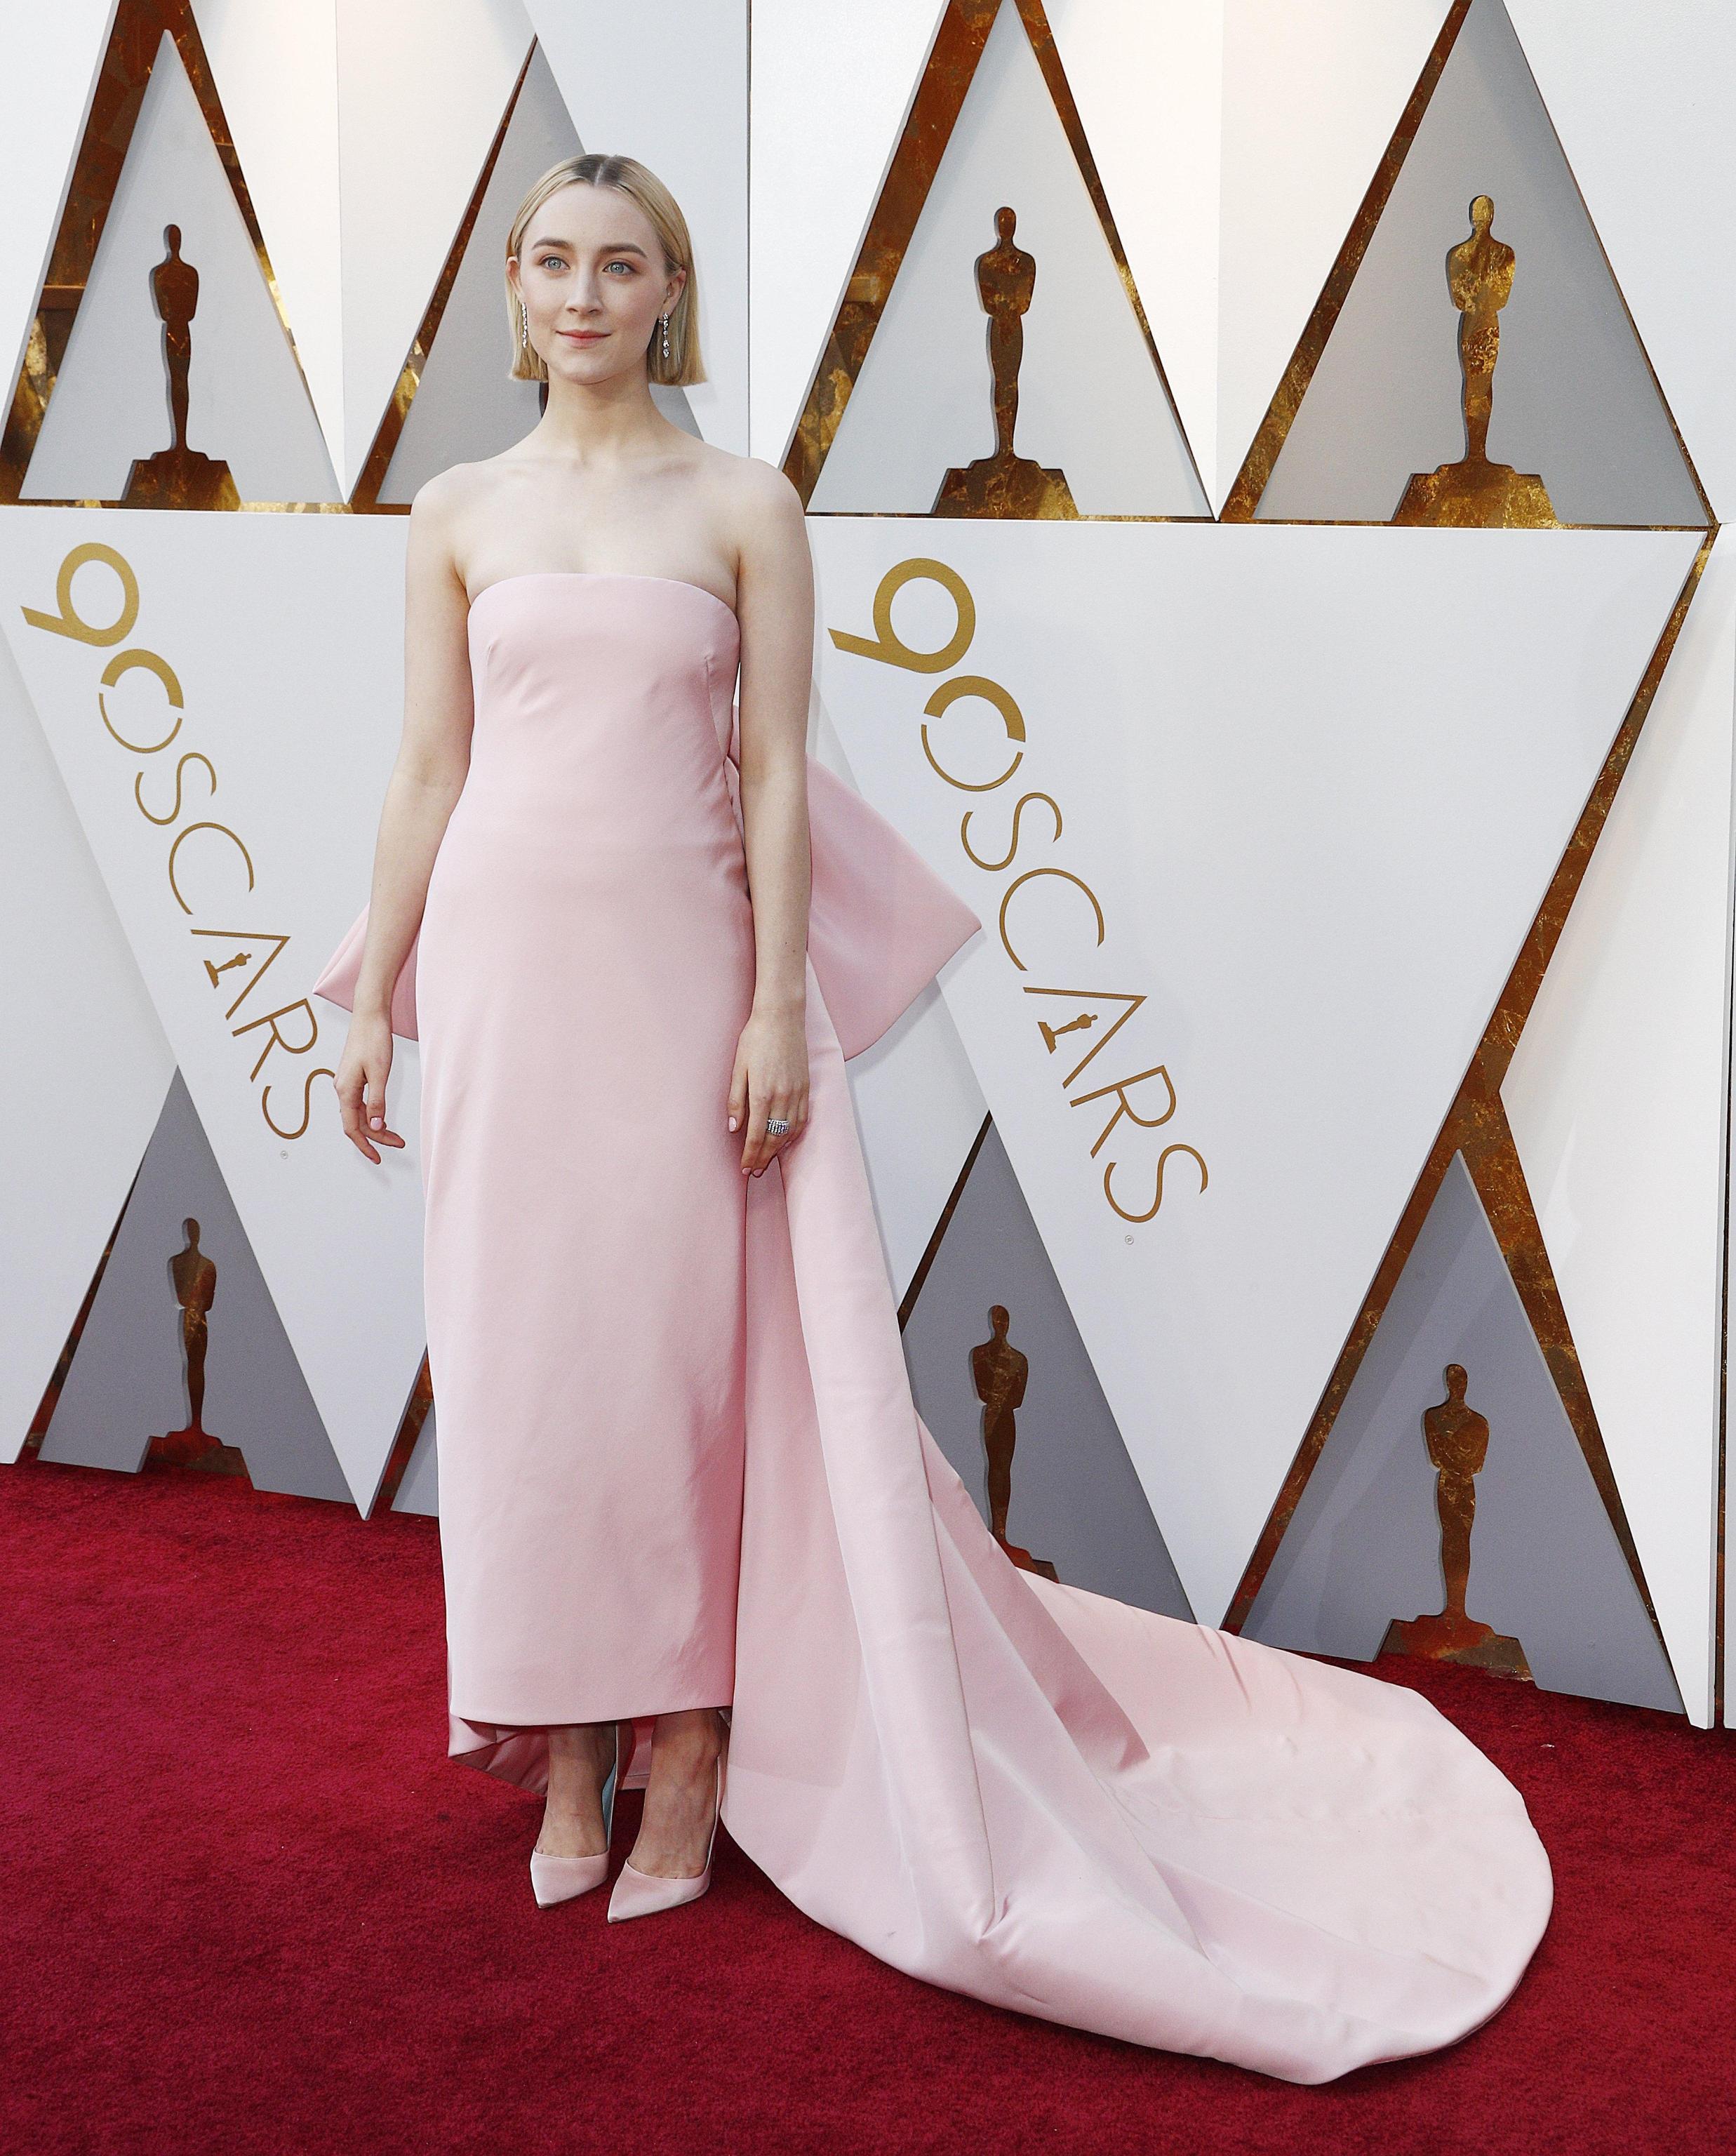 Saoirse Ronan in Calvin Klein By Appointment agli Oscar 2018